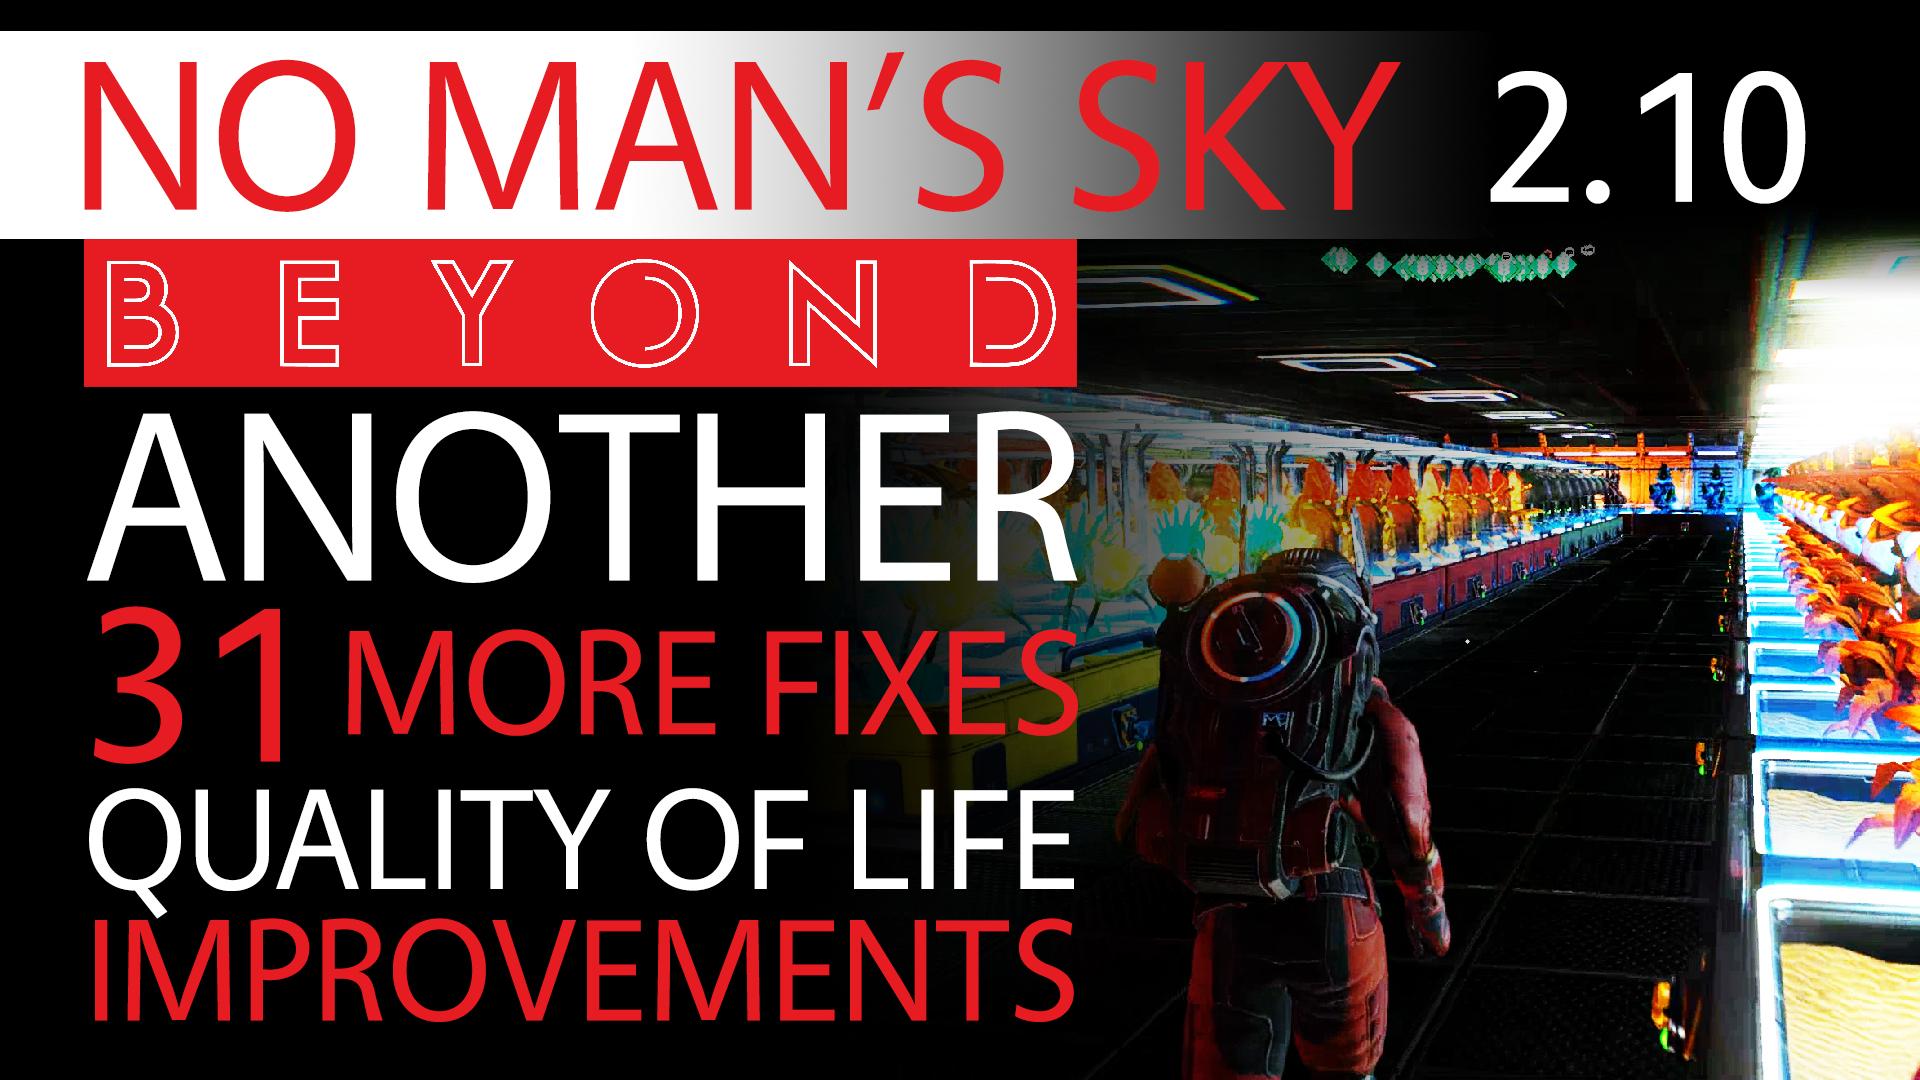 No Man's Sky Beyond News 2.10 brings 31 Bug-Crash Fixes and Quality of Life Improvements Thumbnail